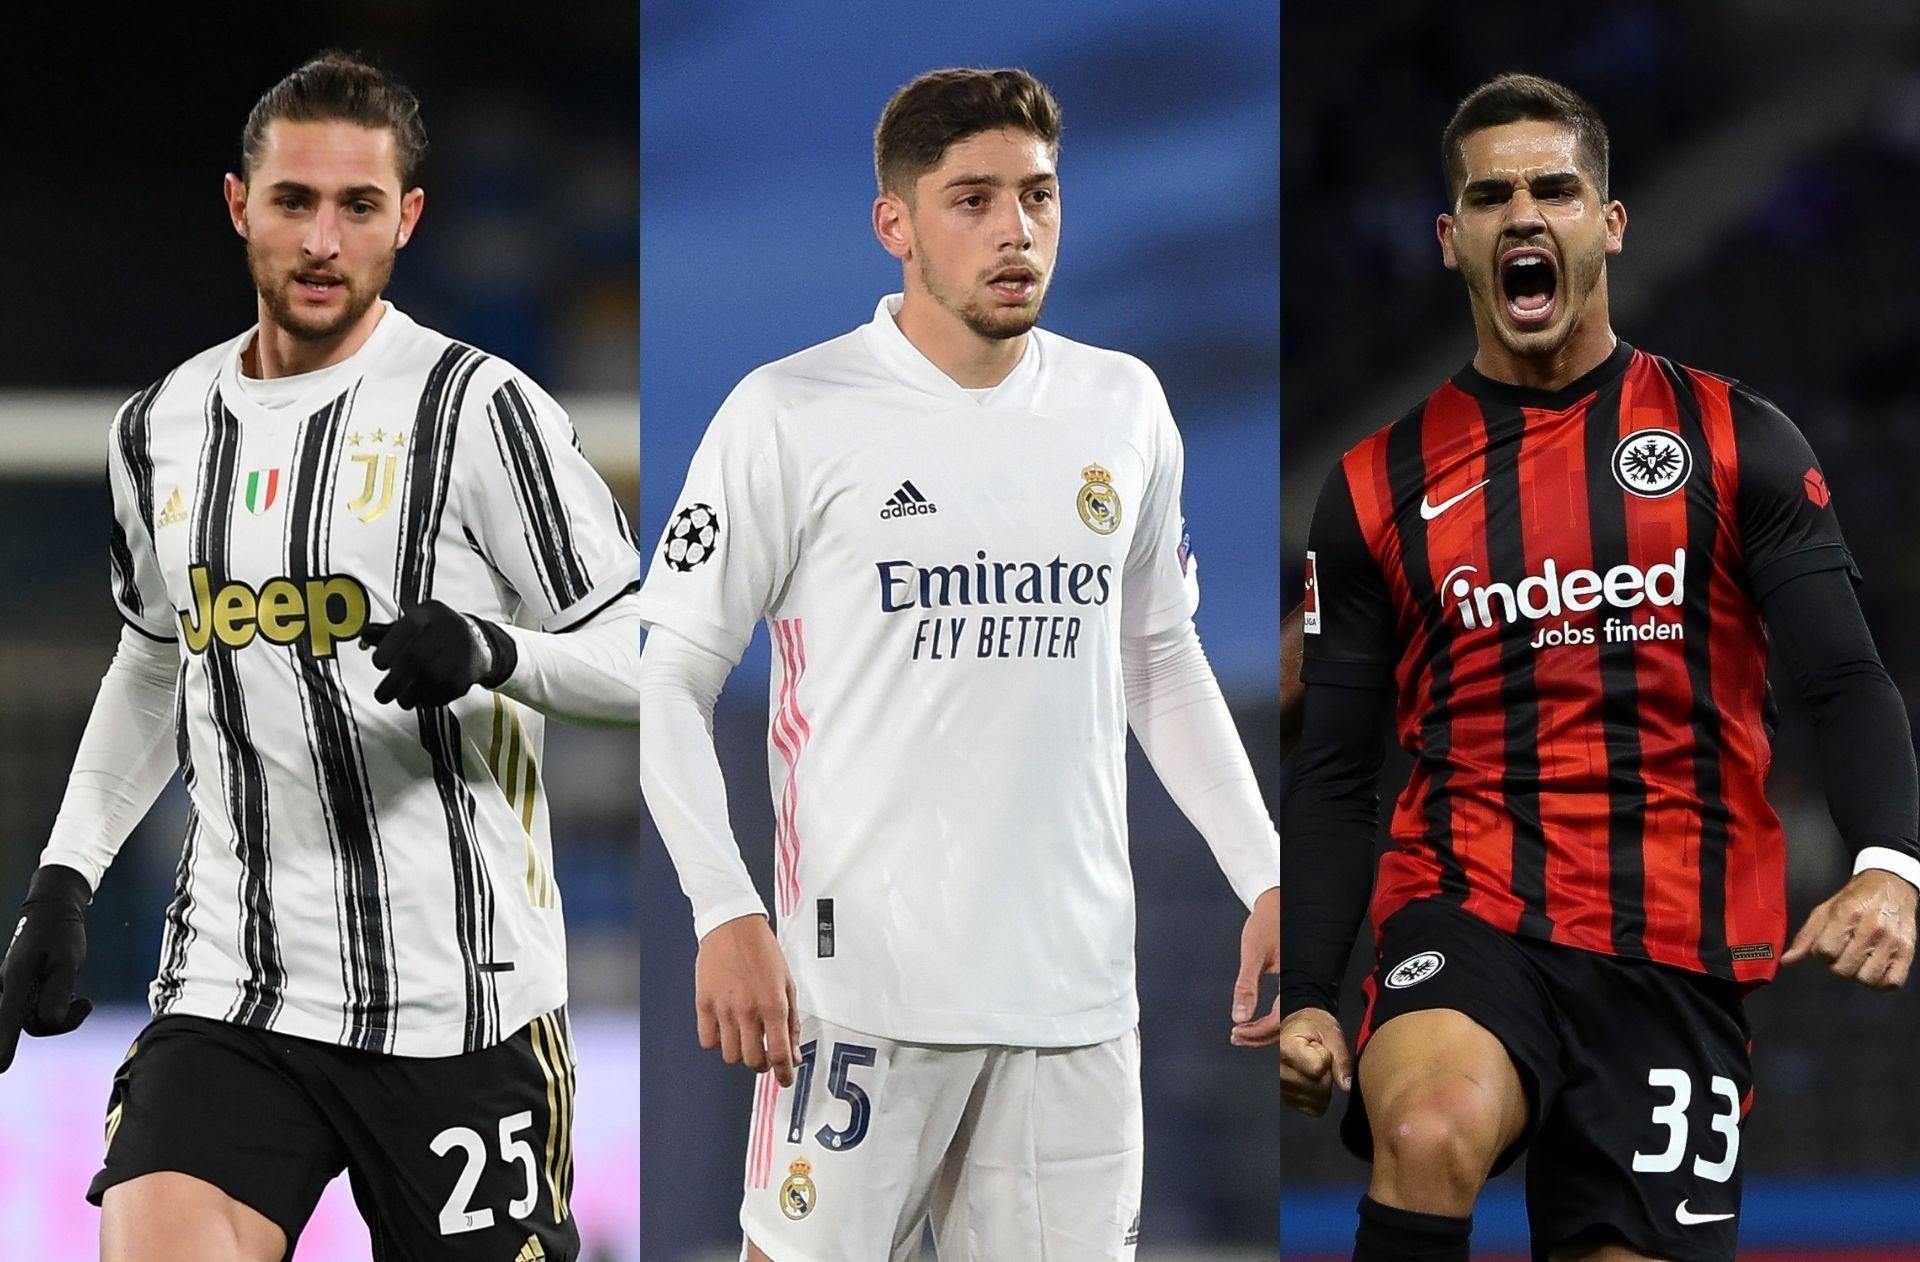 Adrien Rabiot of Juventus, Federico Valverde of Real Madrid, Andre Silva of Eintracht Frankfurt